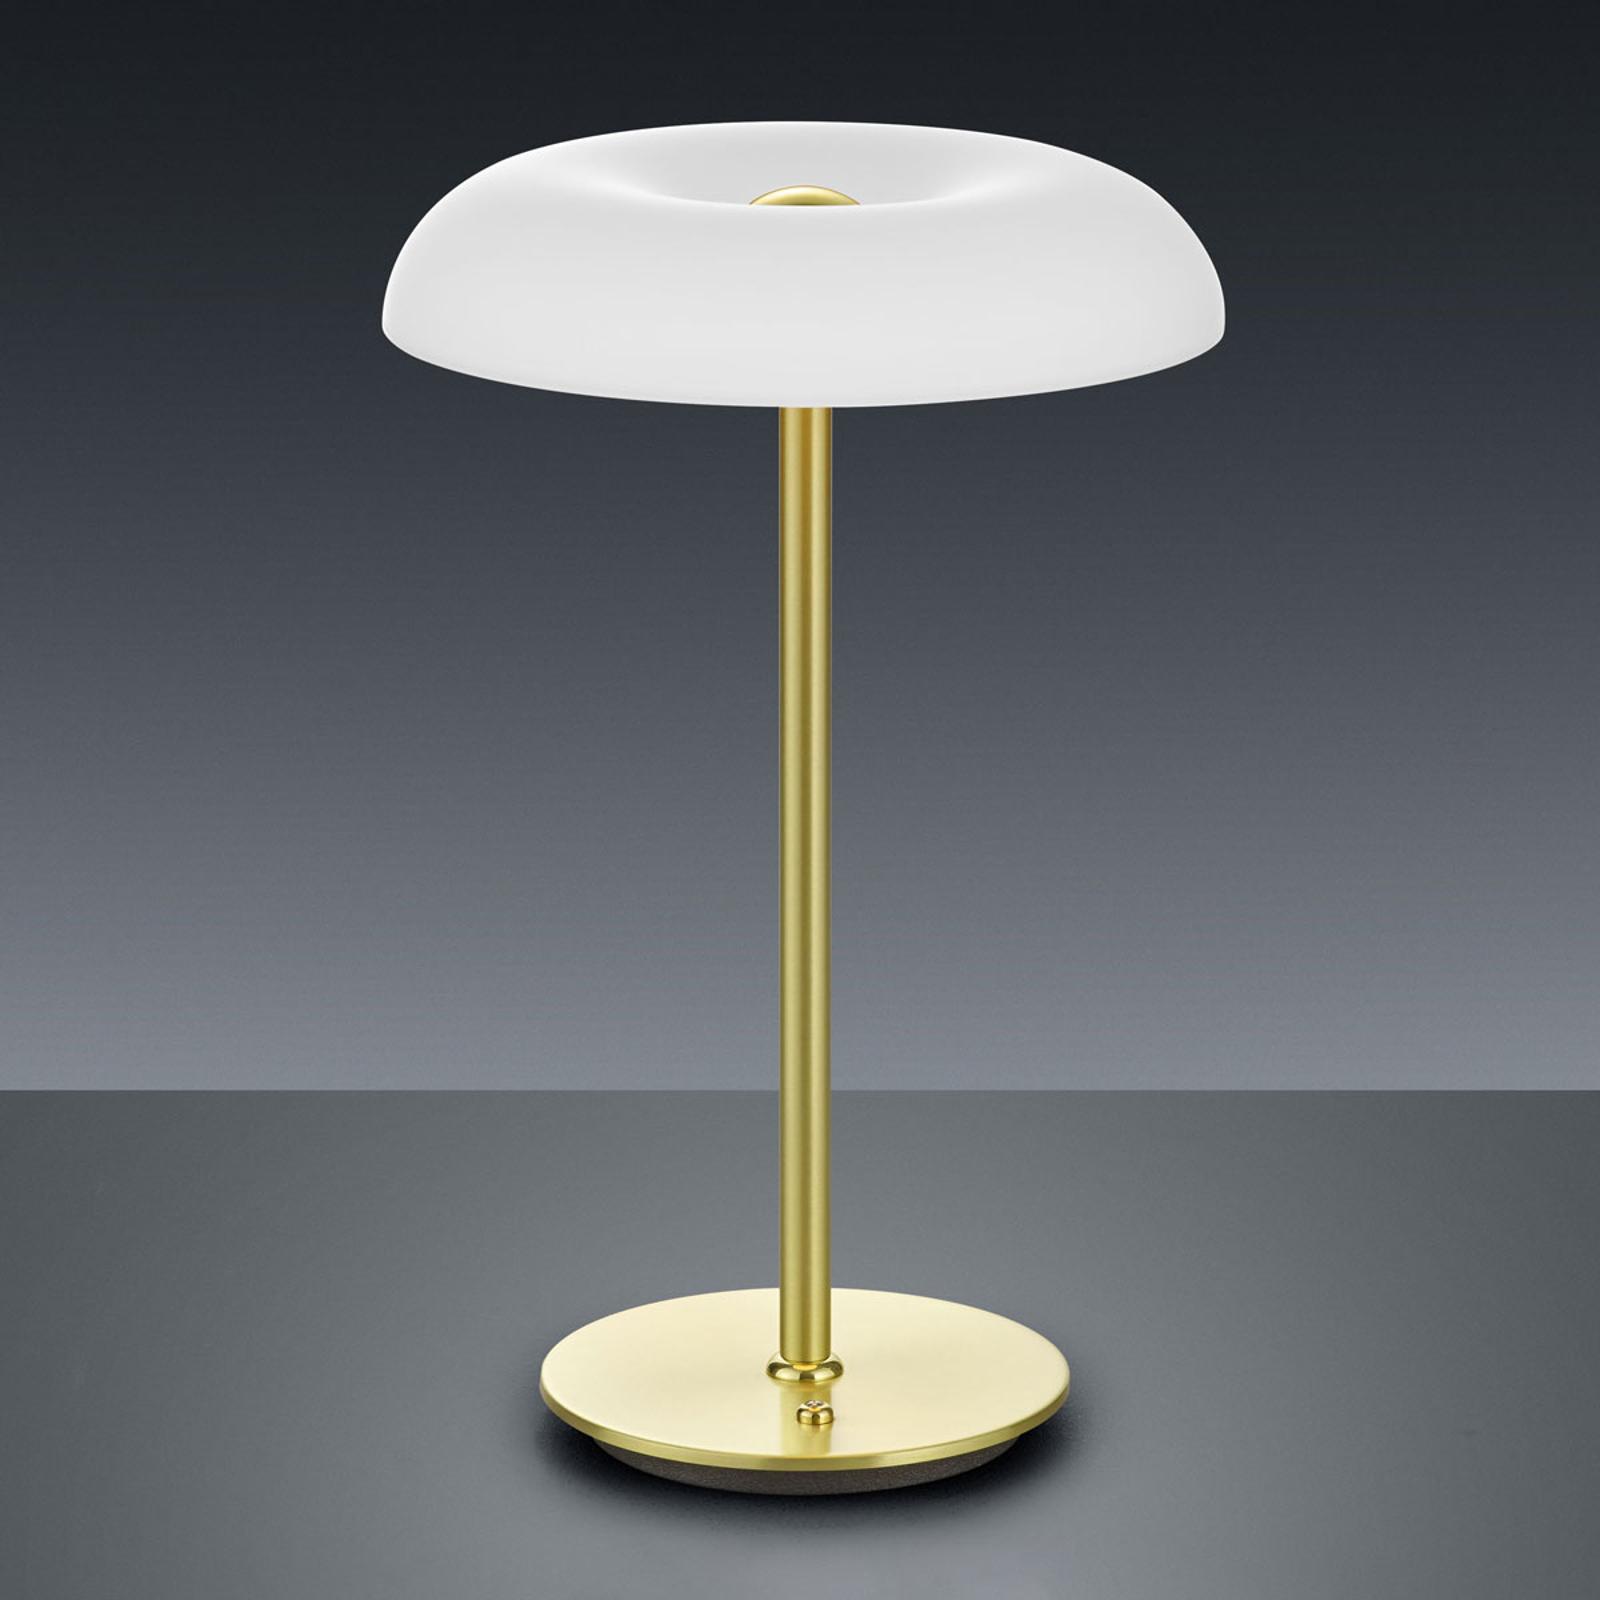 BANKAMP Vanity LED da tavolo dimmer, ottone